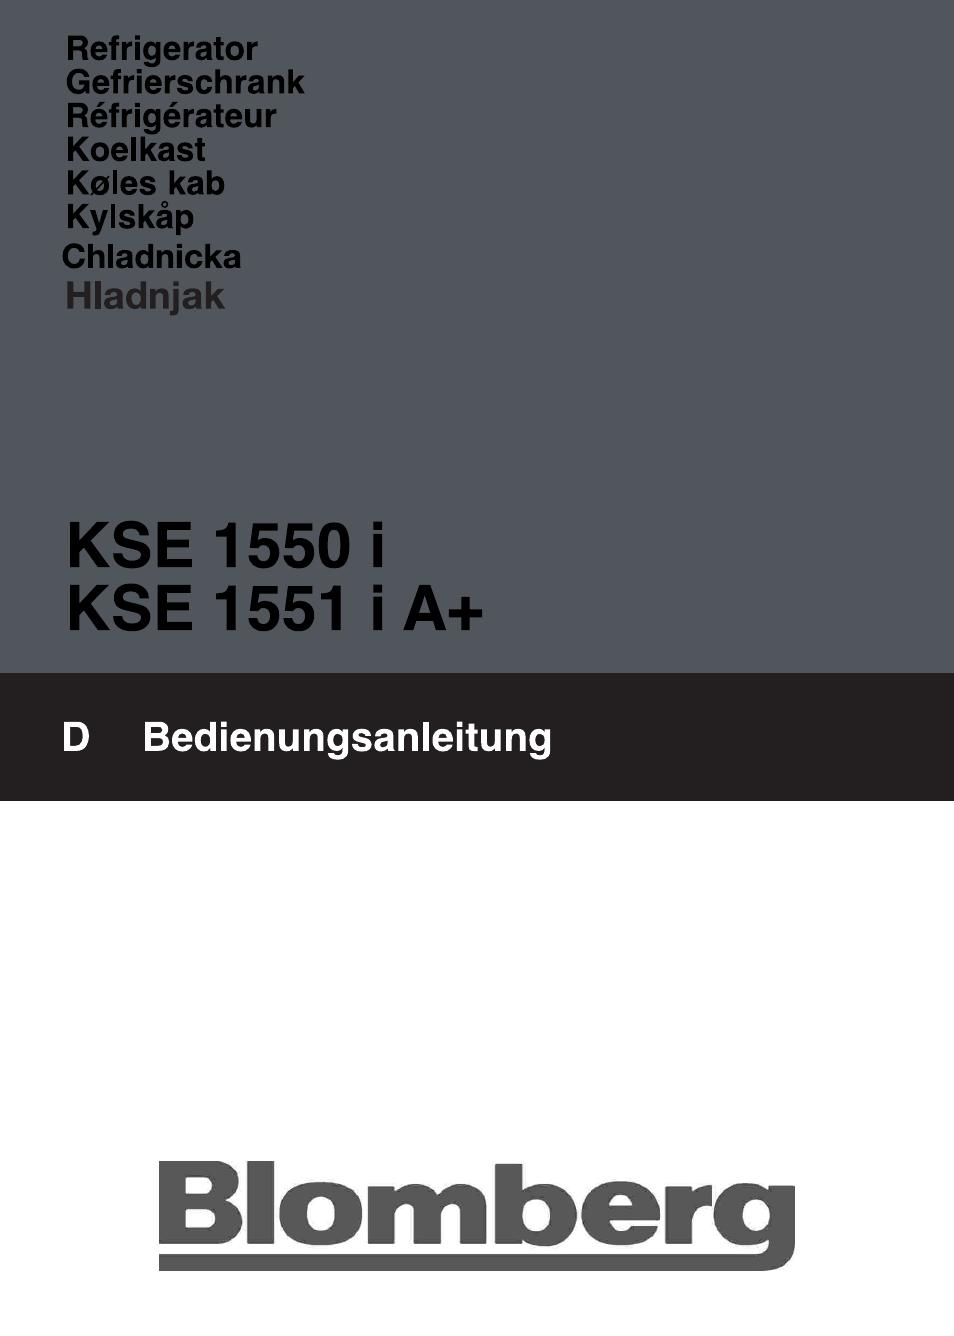 Blomberg KSE 1550 i User Manual | 157 pages | Also for: KSE 1551 i A+